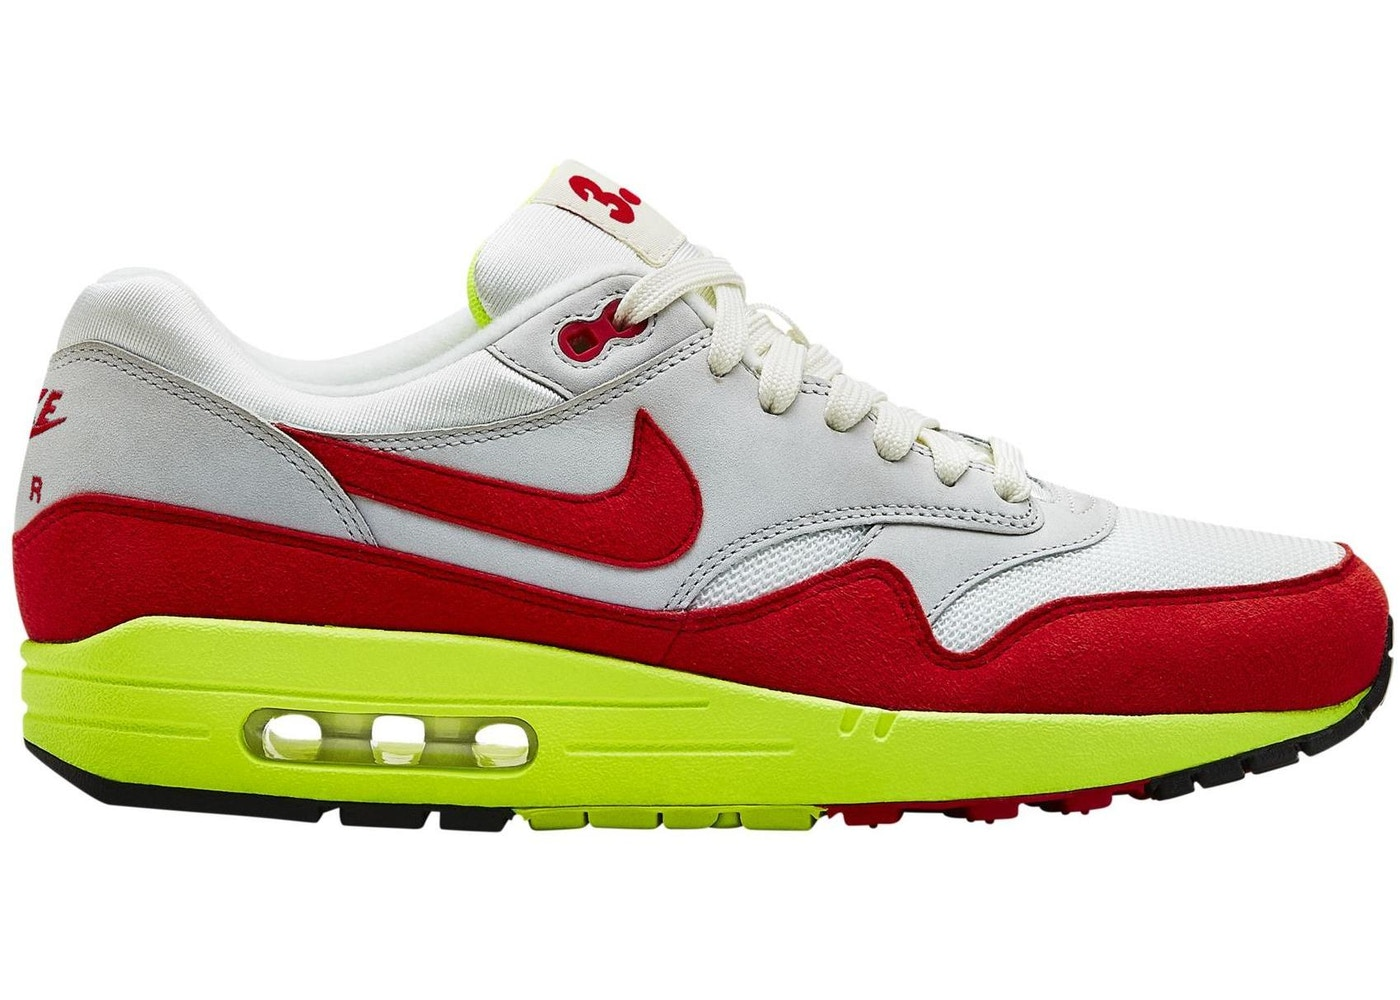 sale retailer 94749 2be97 ... Air Max 1 Air Max Day 3.26 Nike ...